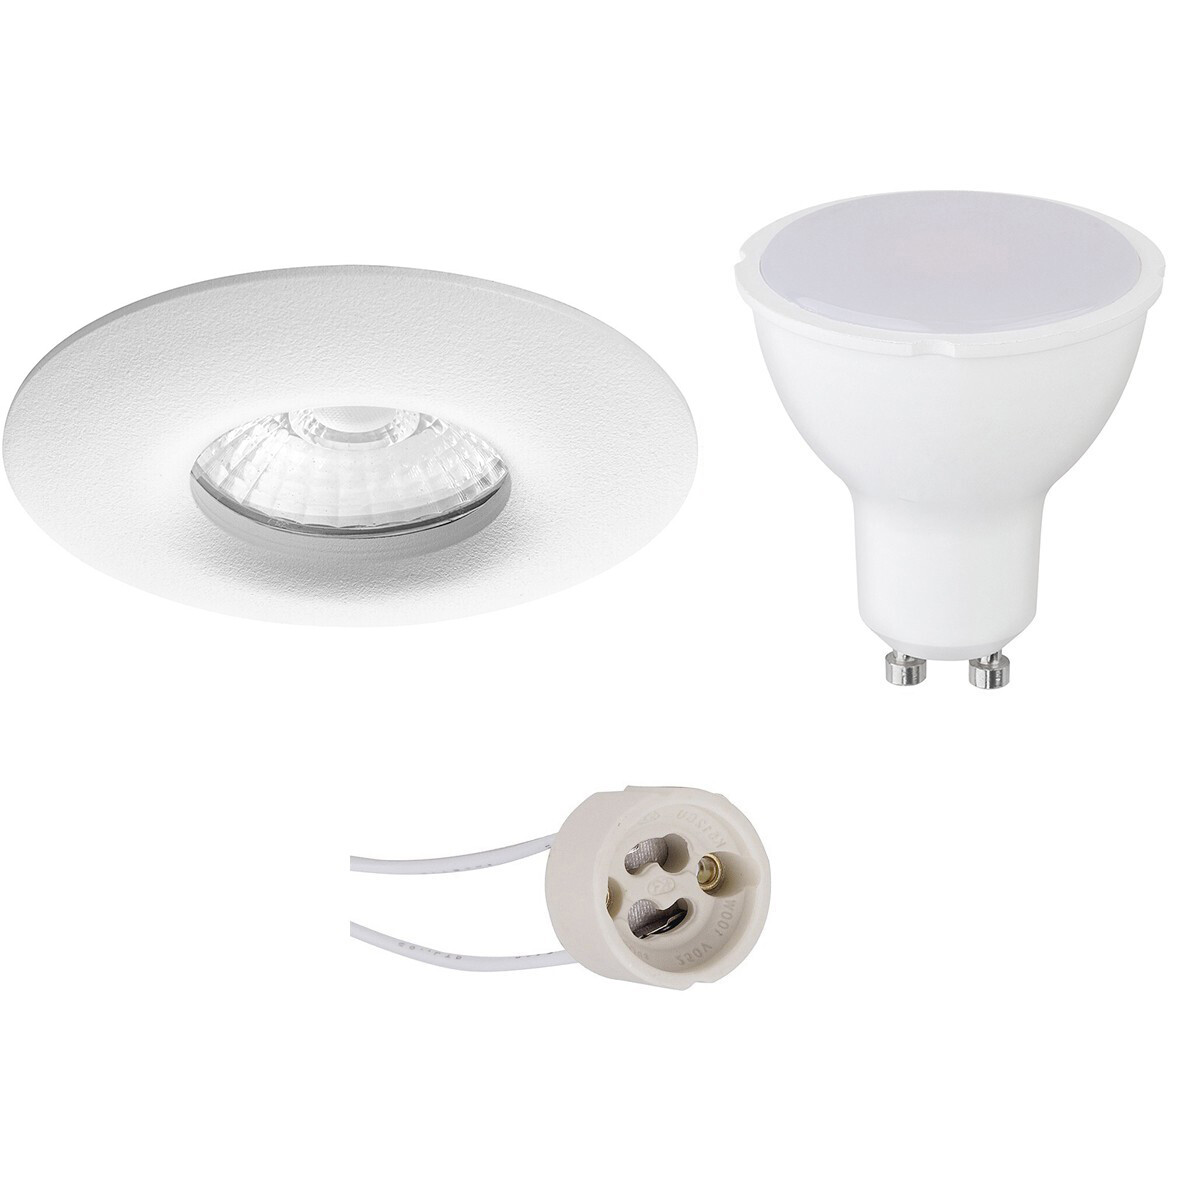 LED Spot Set - Pragmi Luno Pro - Waterdicht IP65 - GU10 Fitting - Dimbaar - Inbouw Rond - Mat Wit -